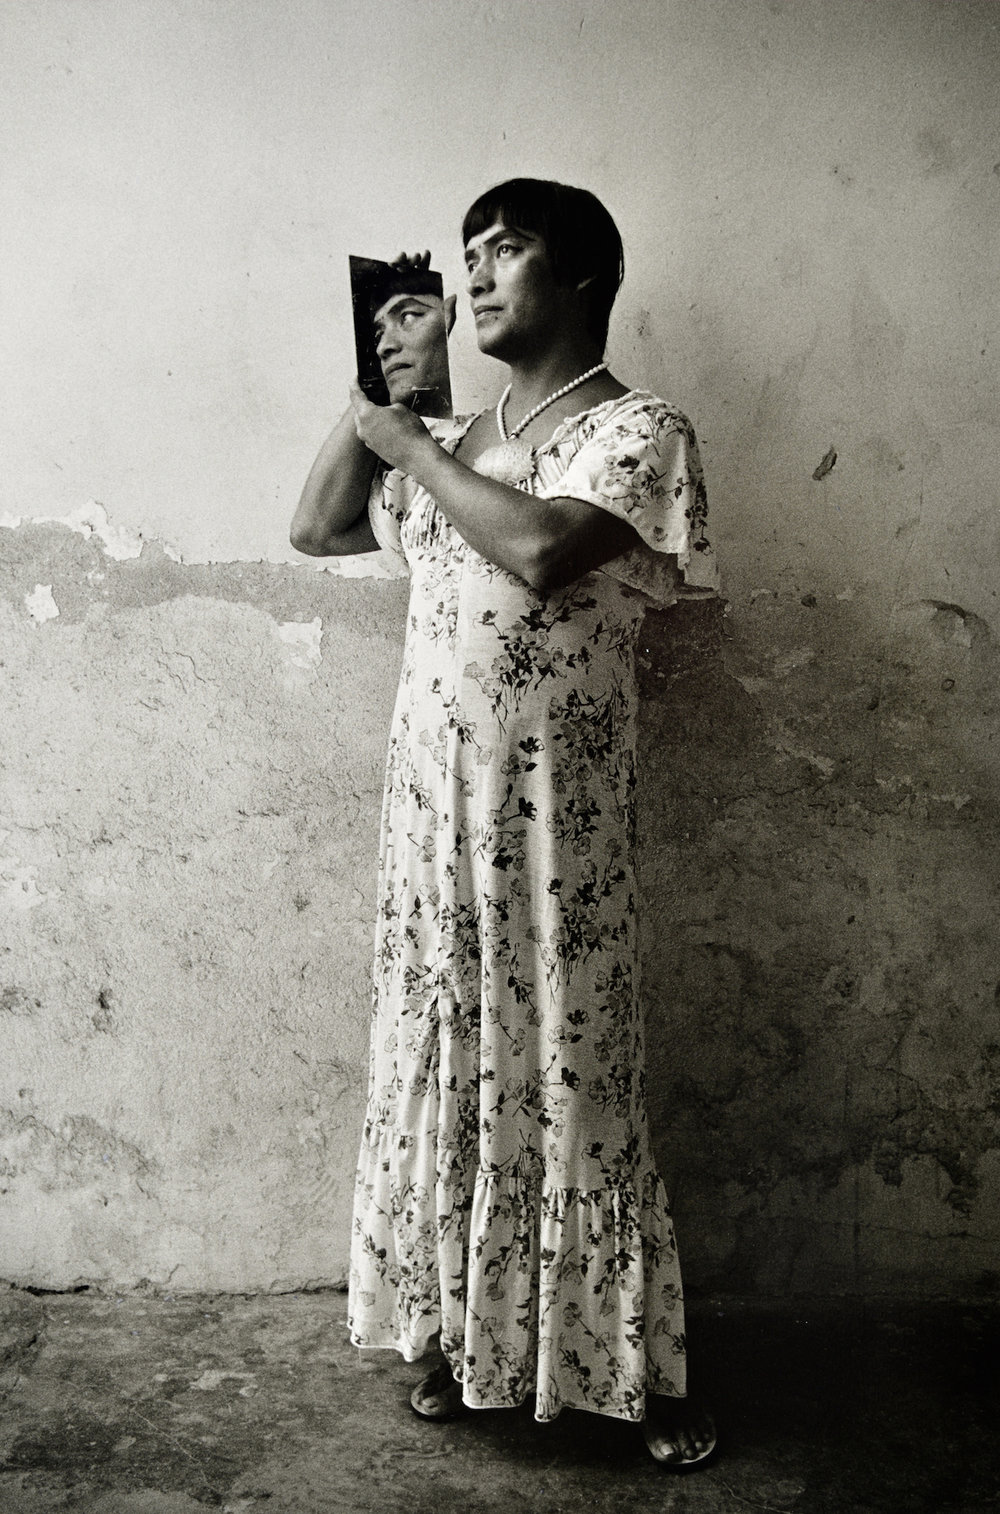 Graciela Iturbide    Magnolia en el espejo, Juchitán, Oaxaca,  1986  12 x 9 inch Silver Gelatin Print